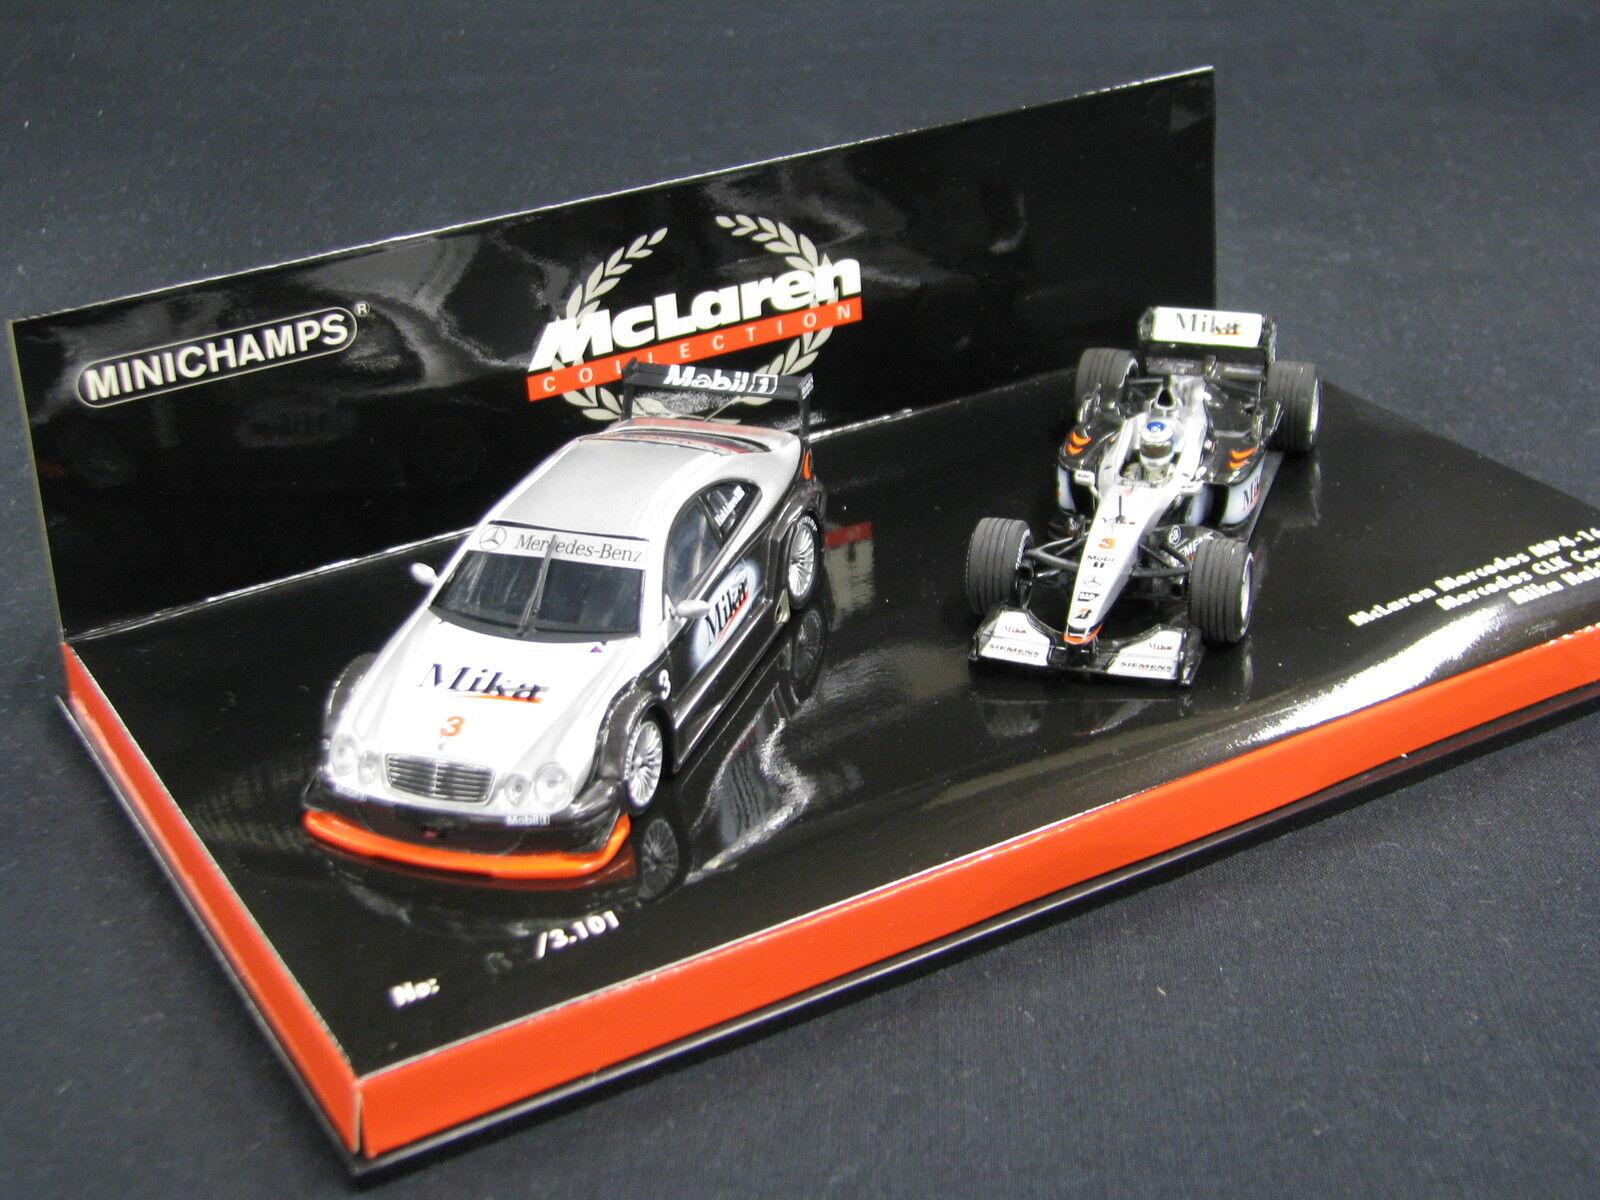 Minichamps McLaren Mercedes MP4 16 2001   Mercedes CLK DTM 1 43 Hakkinen (JS)